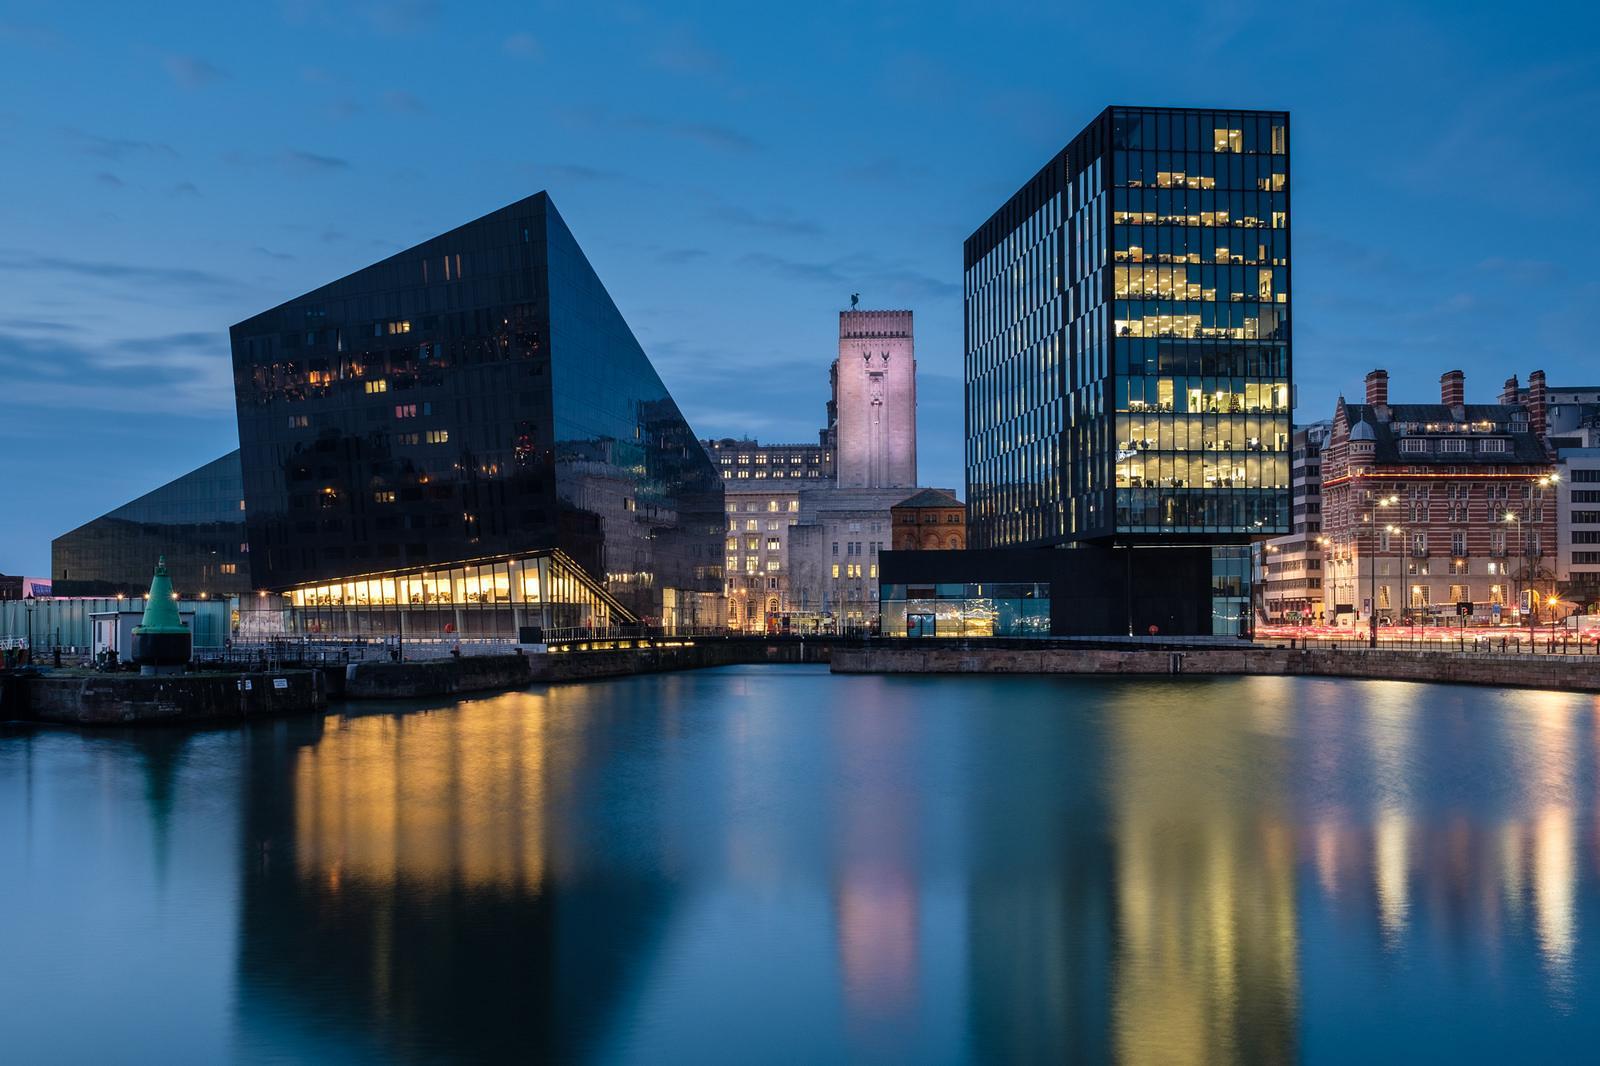 Liverpool Blue Hour Photography Workshop